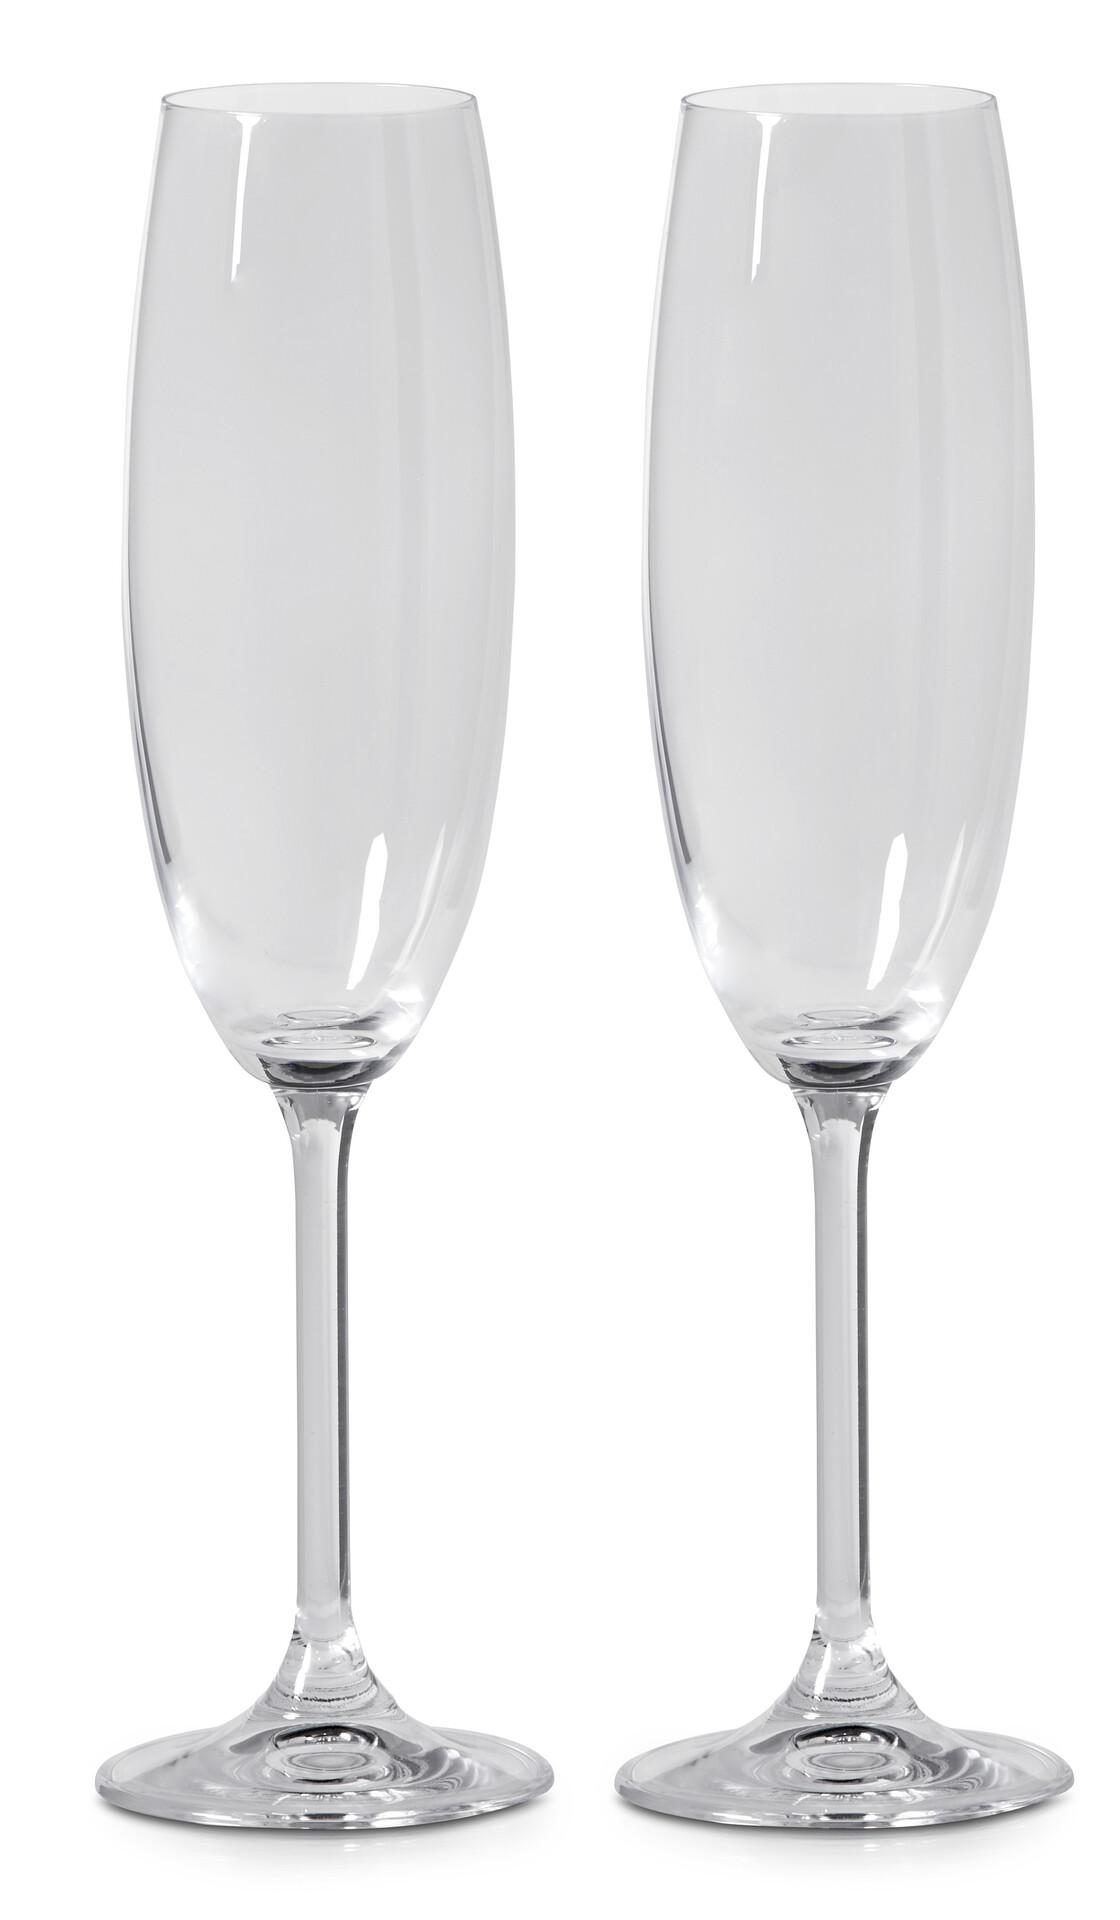 Nice Bitz Champagneglas, 2-pack | Glas/Porslin/Husgeråd | Mio QU32